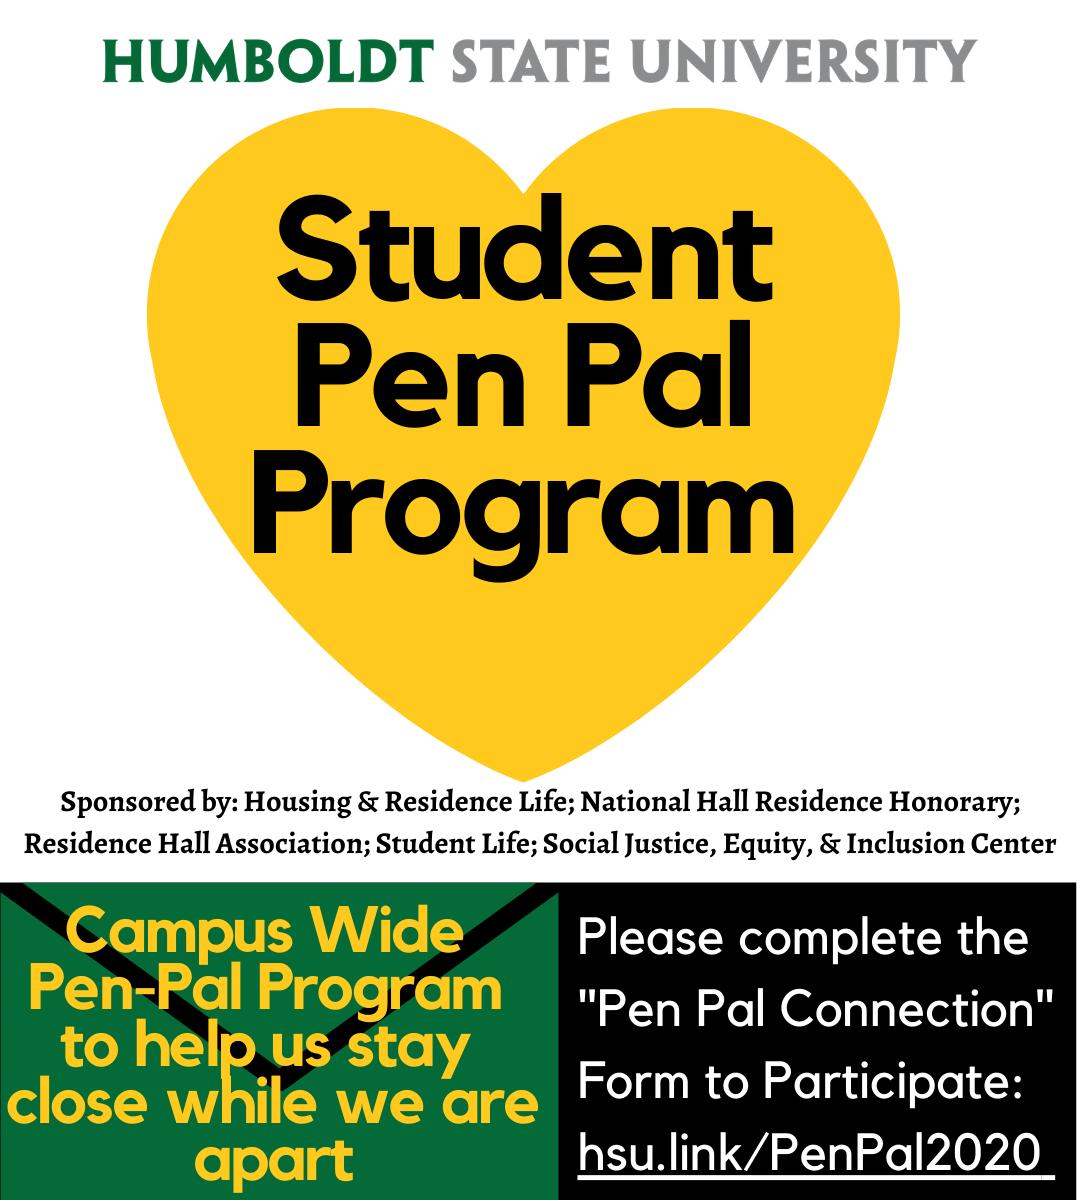 "Student Pen Pal Program. Campus Wide  Pen-Pal Program  to help us stay  close while we are apart. Please complete the  ""Pen Pal Connection"" Form to Participate: hsu.link/PenPal2020"